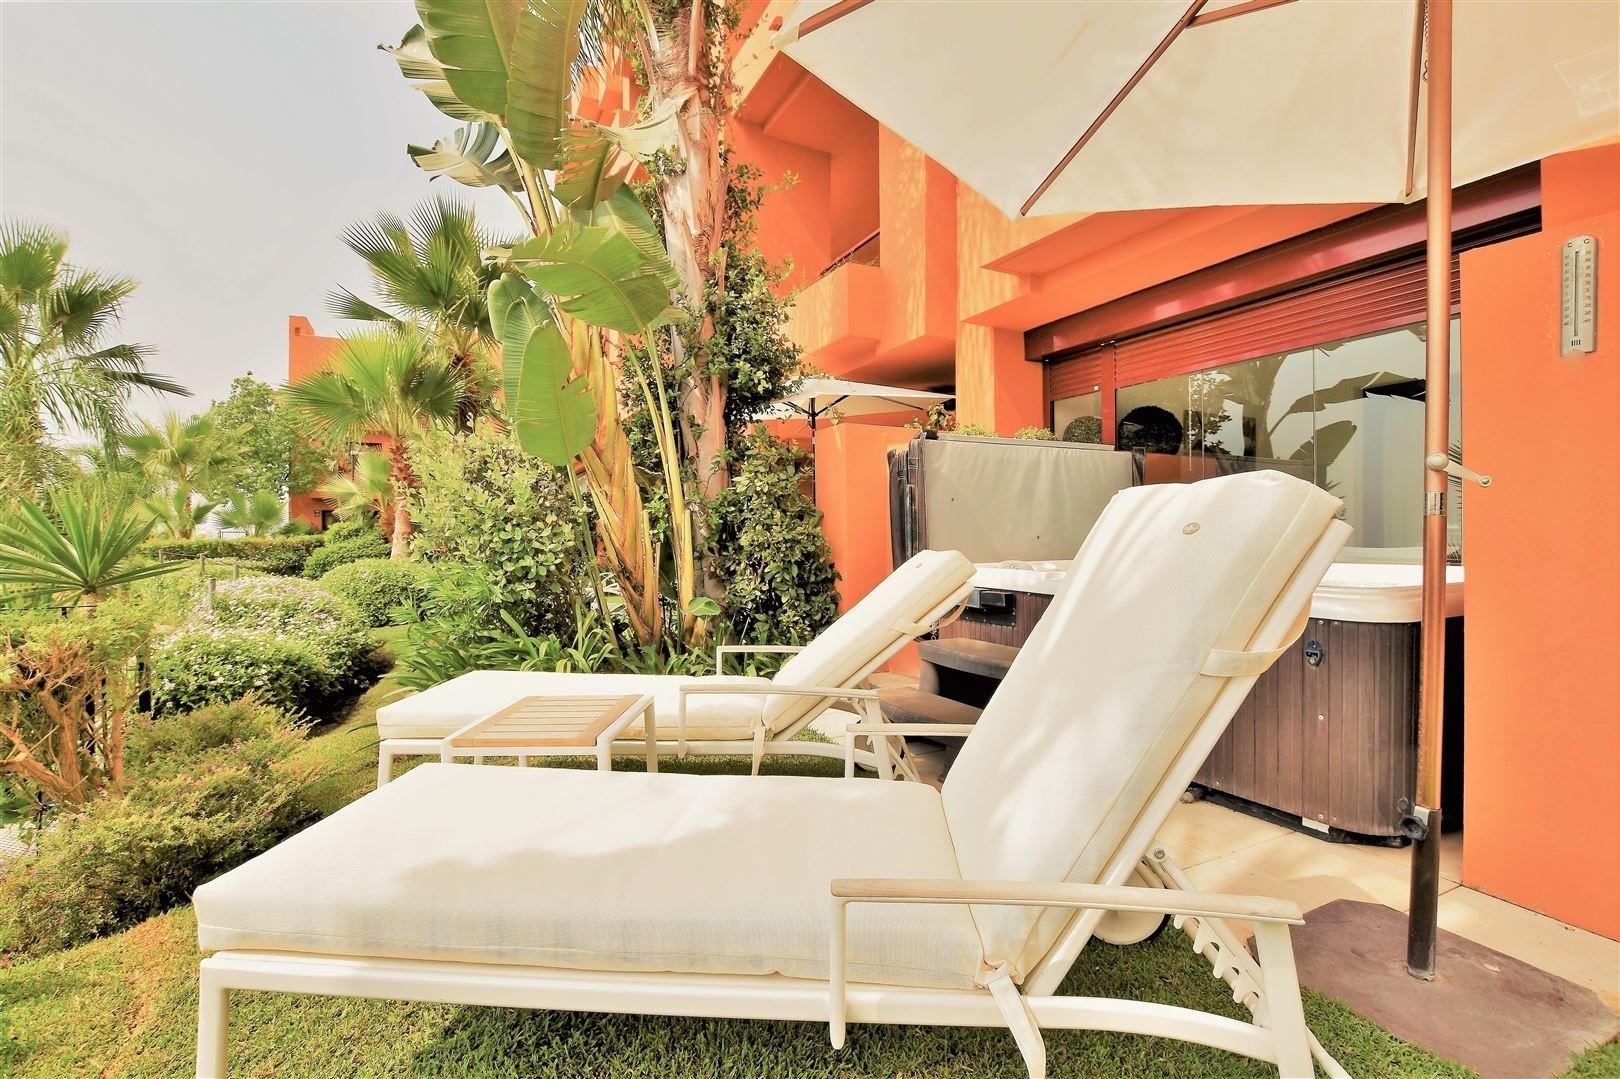 Foto 11 : Appartement te 29679 MARBELLA (Spanje) - Prijs € 1.750